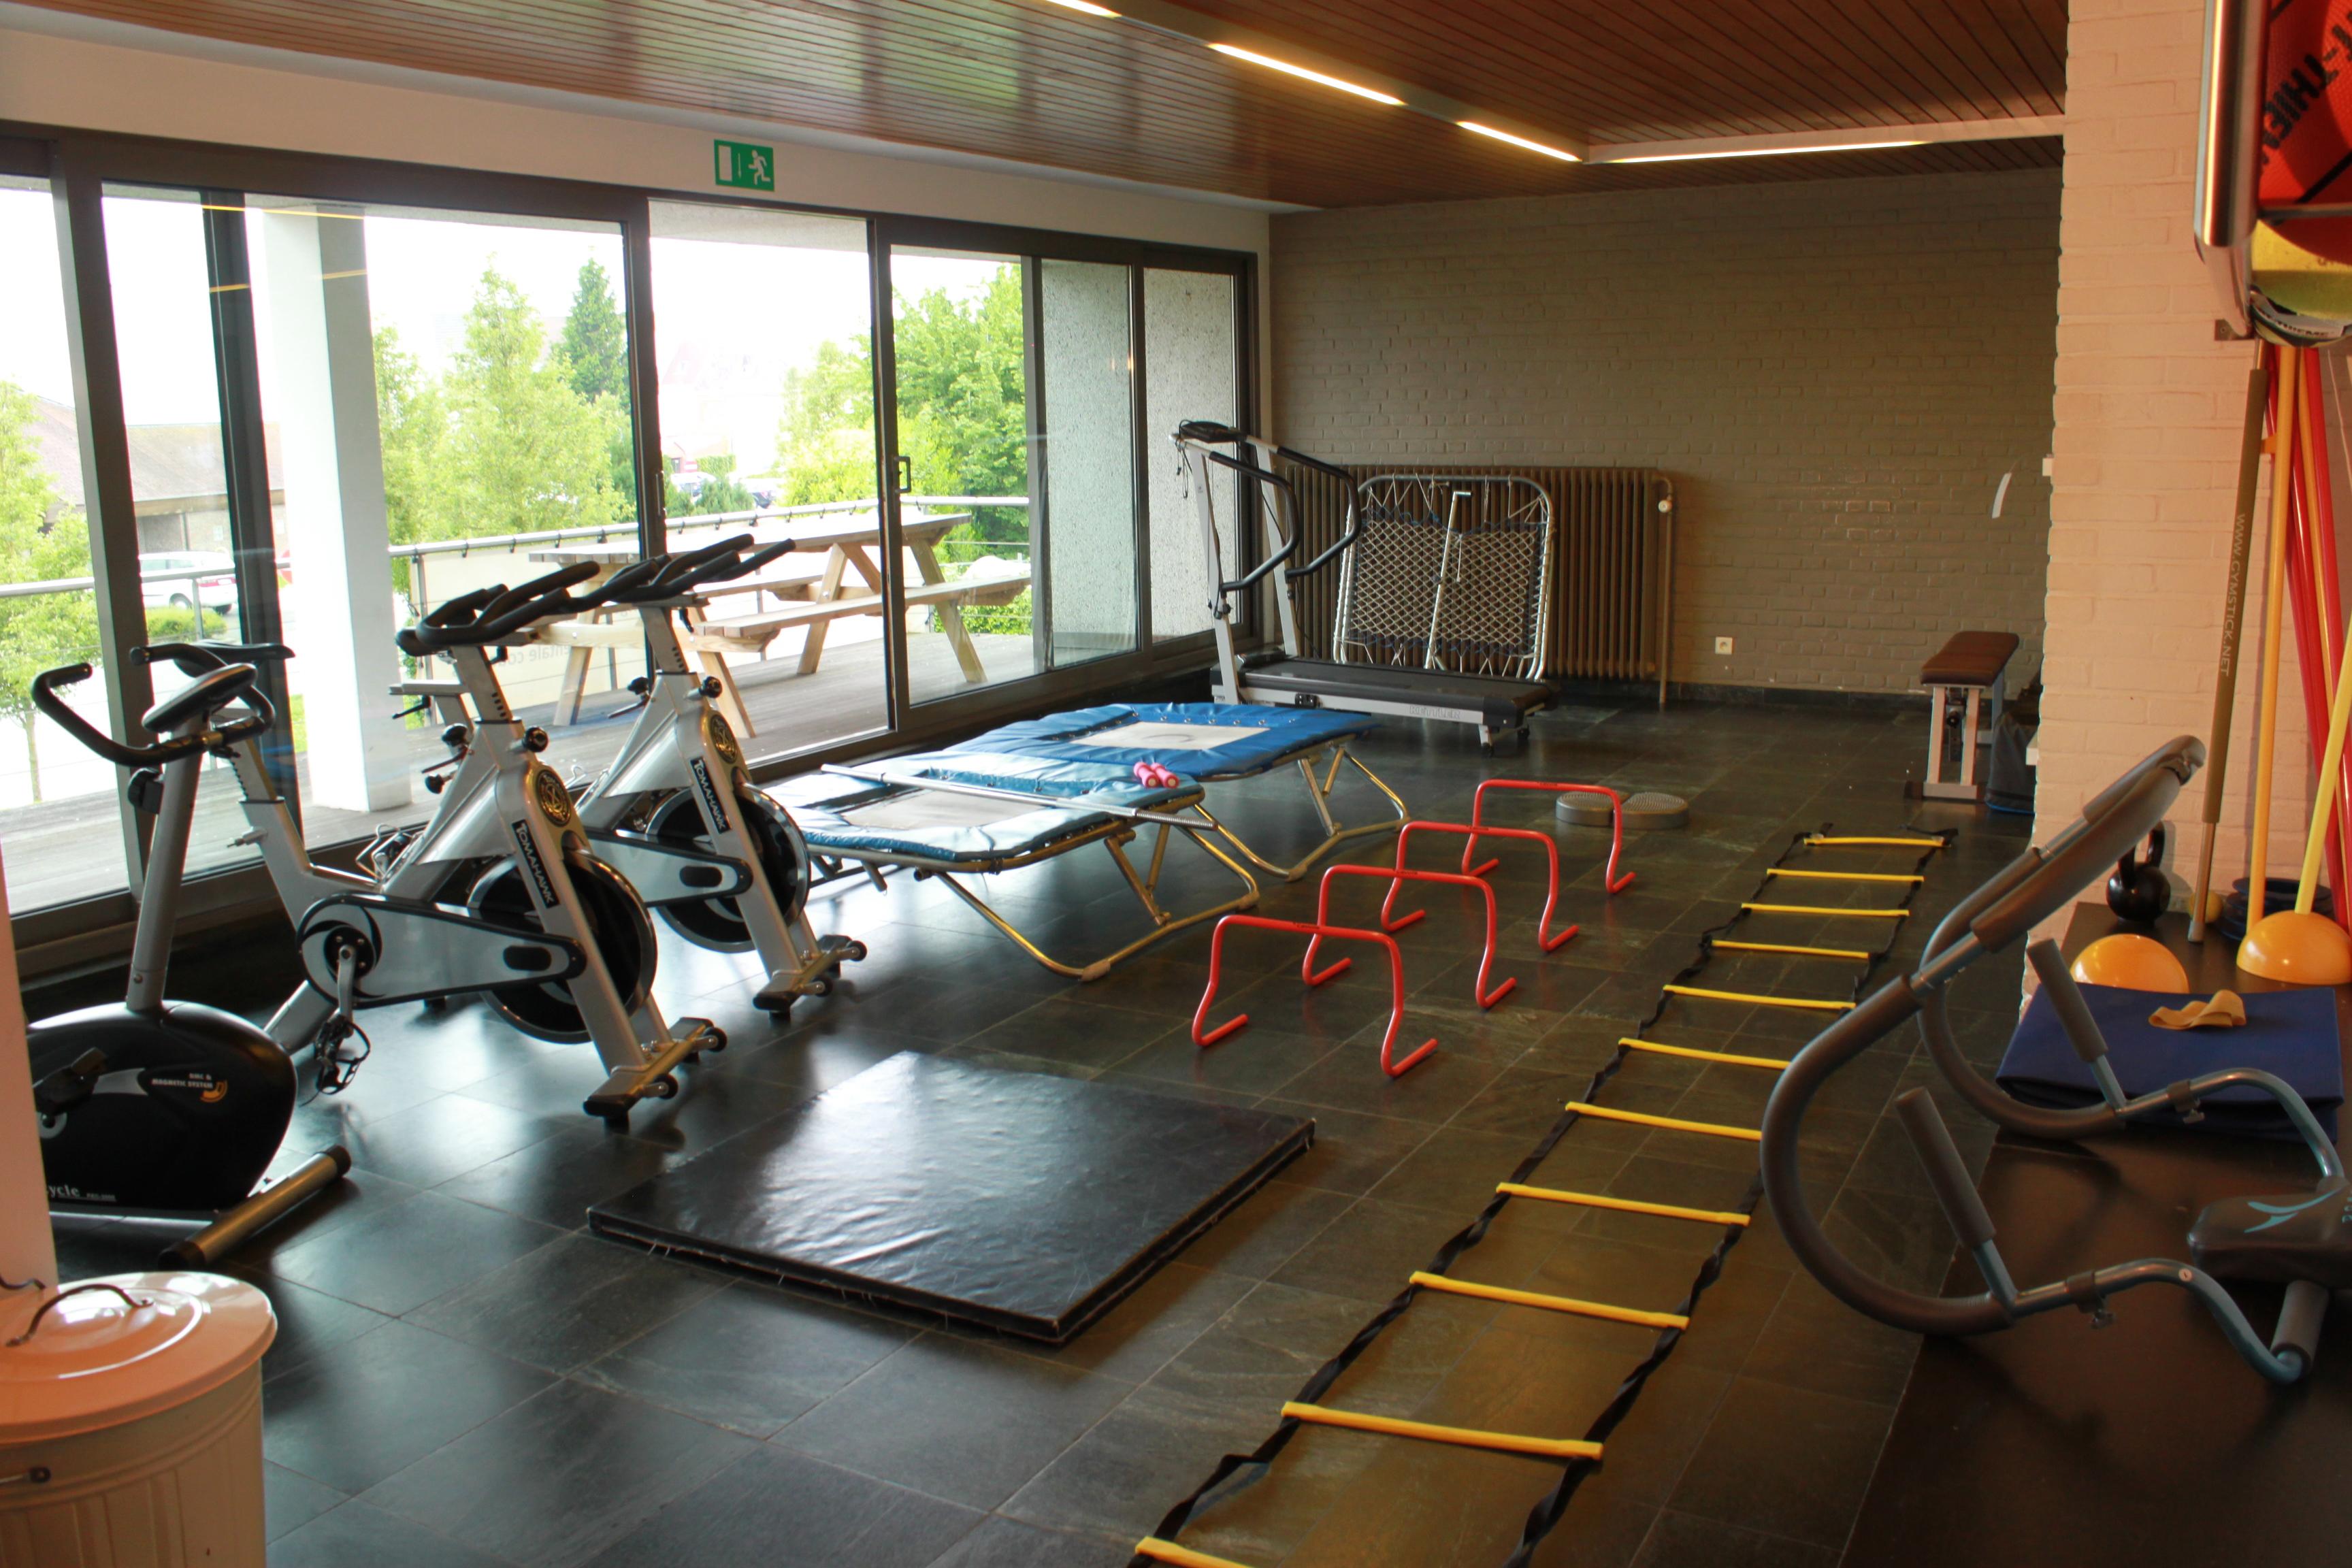 hometrainer koersfiets, loopband oefenzaal kine trampoline revalidatie